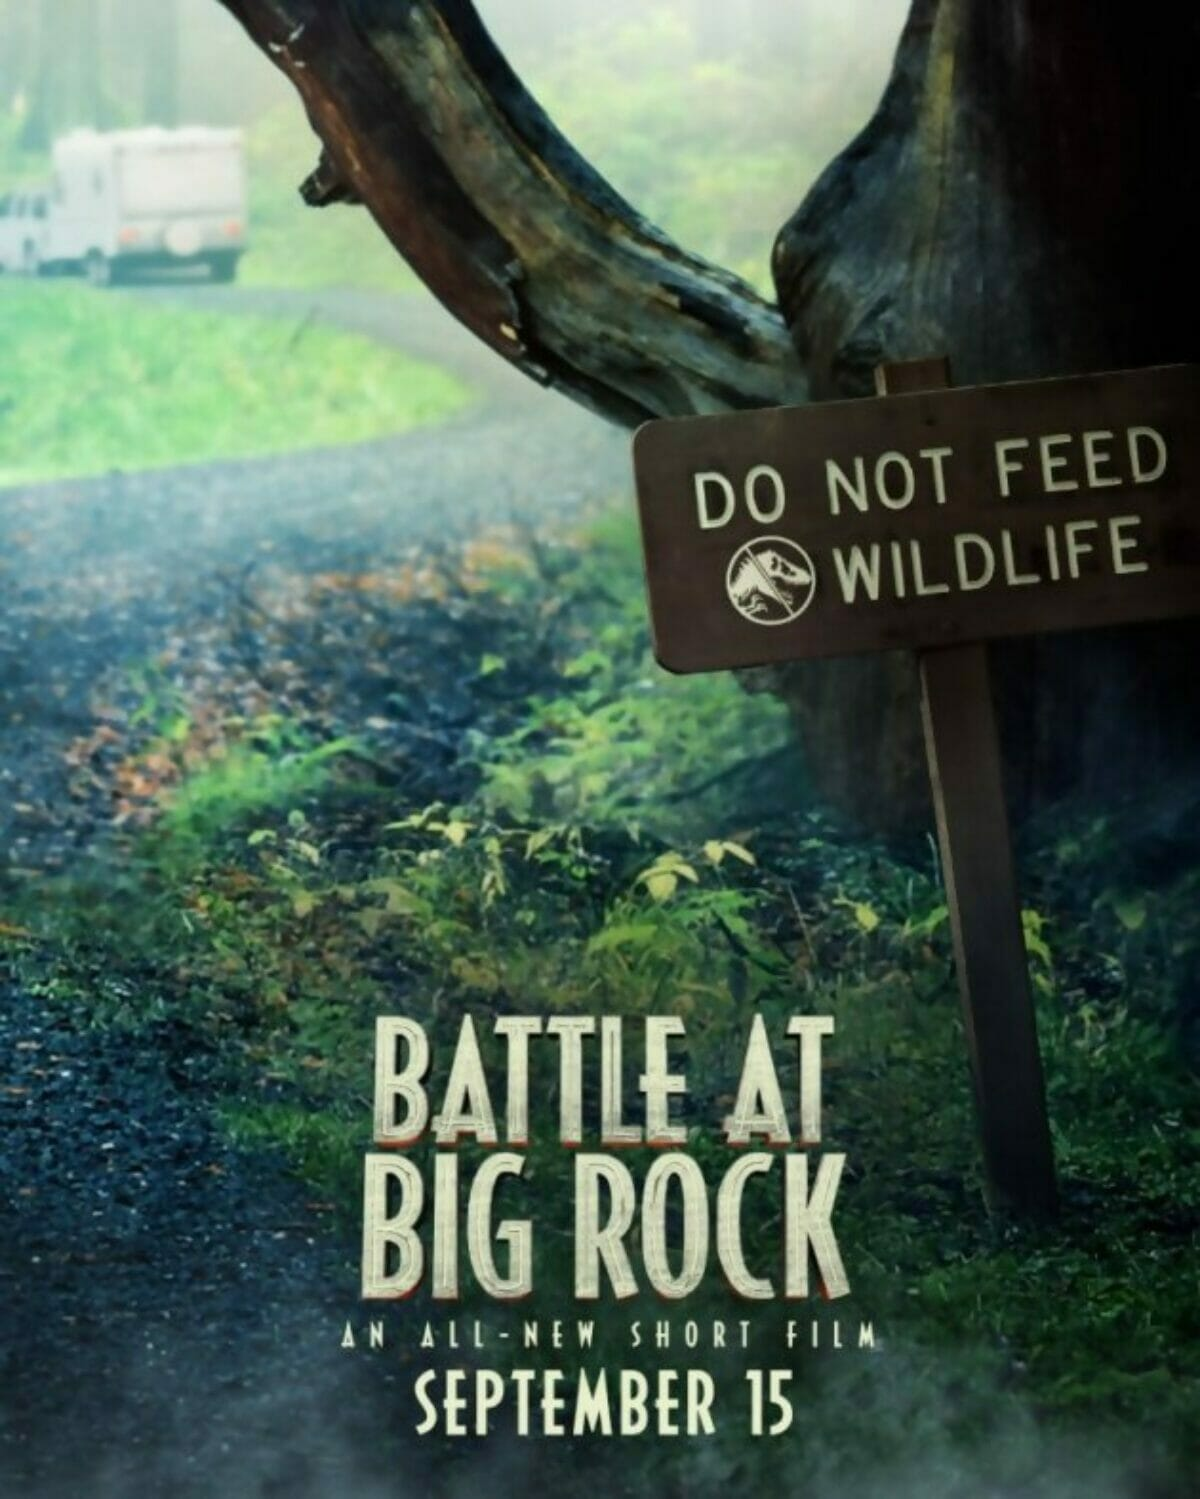 jurassic-world-Battle-at-Big-Rock